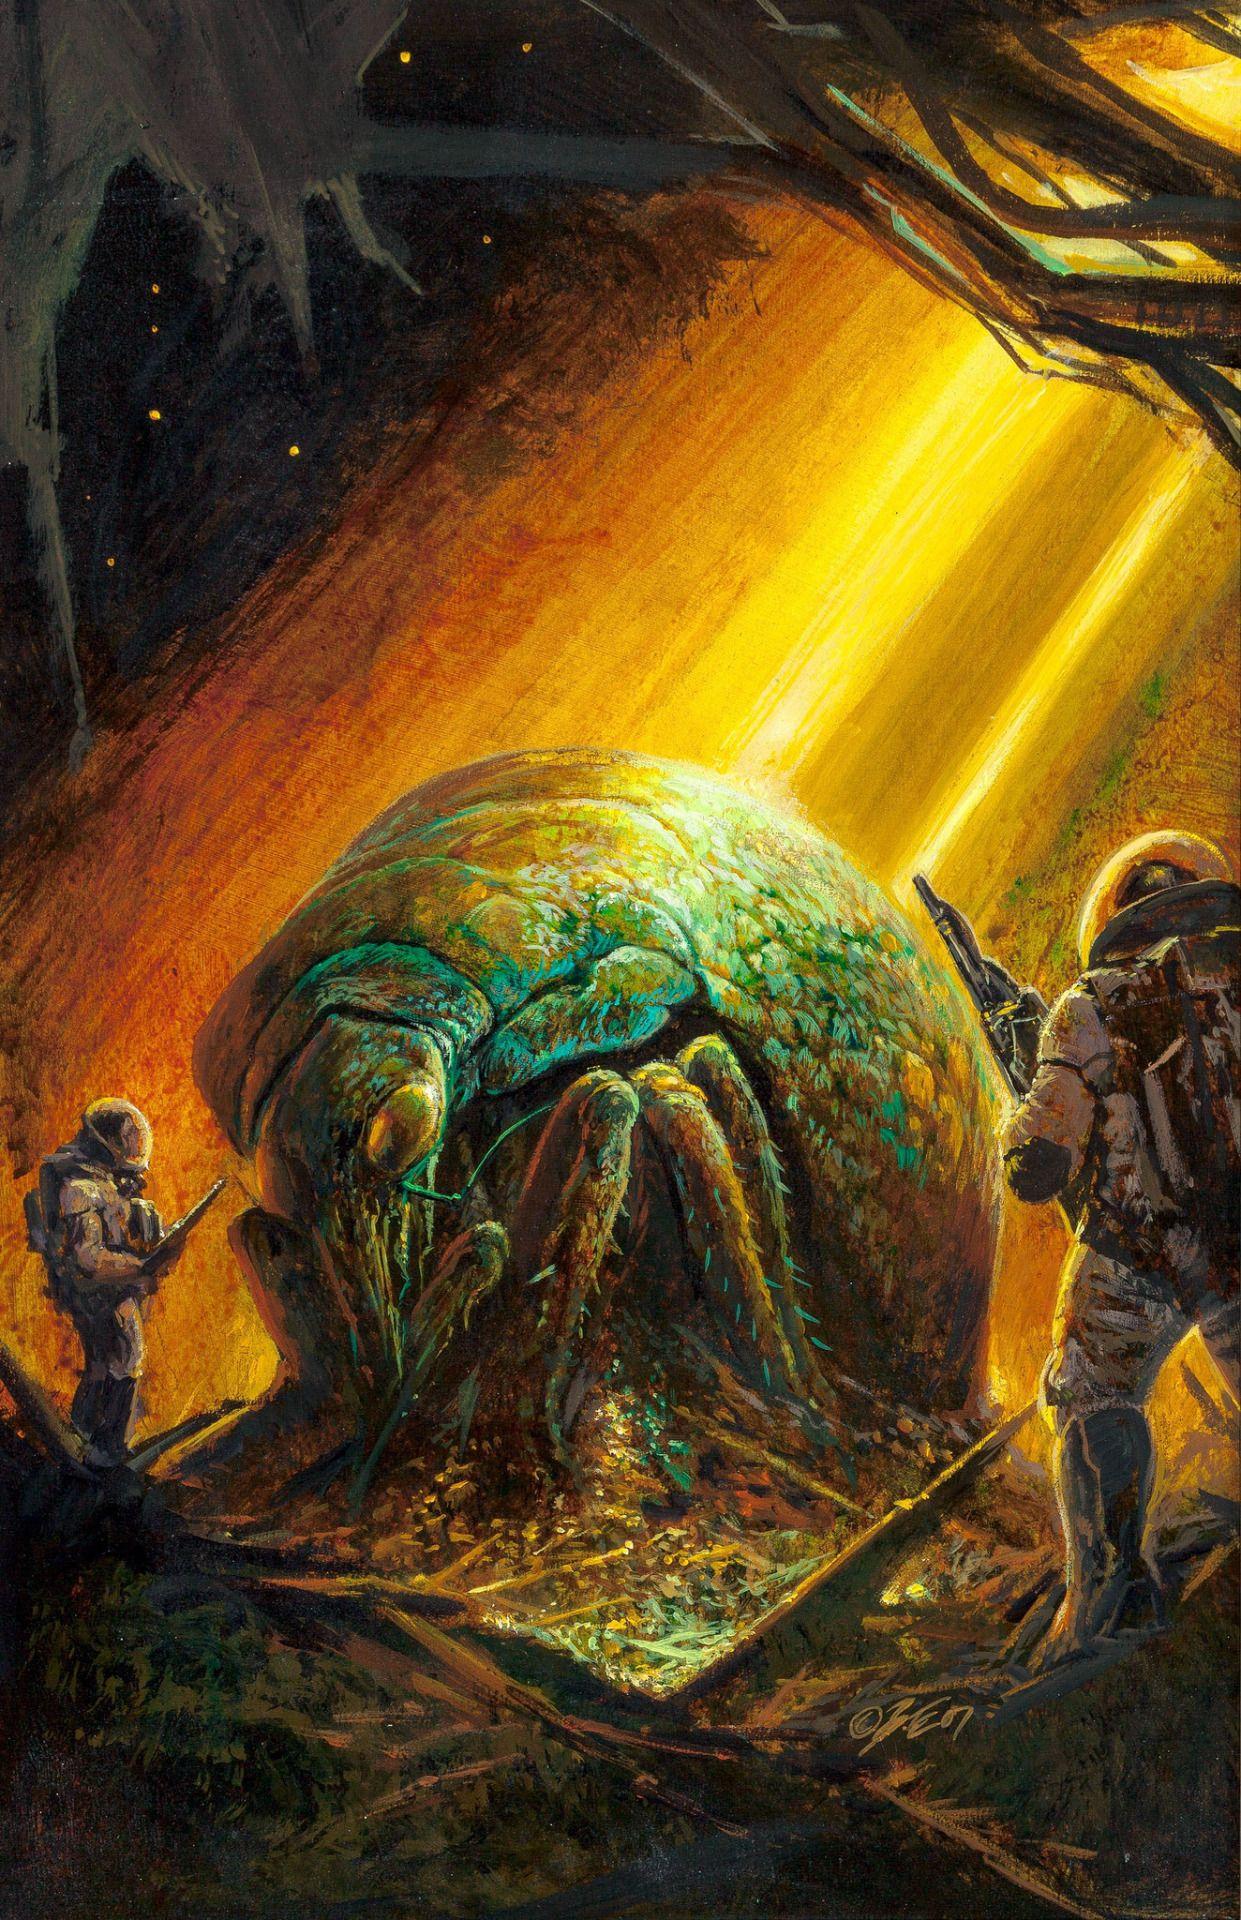 Bob Eggleton Science Fiction Art In 2019 70s Sci Fi